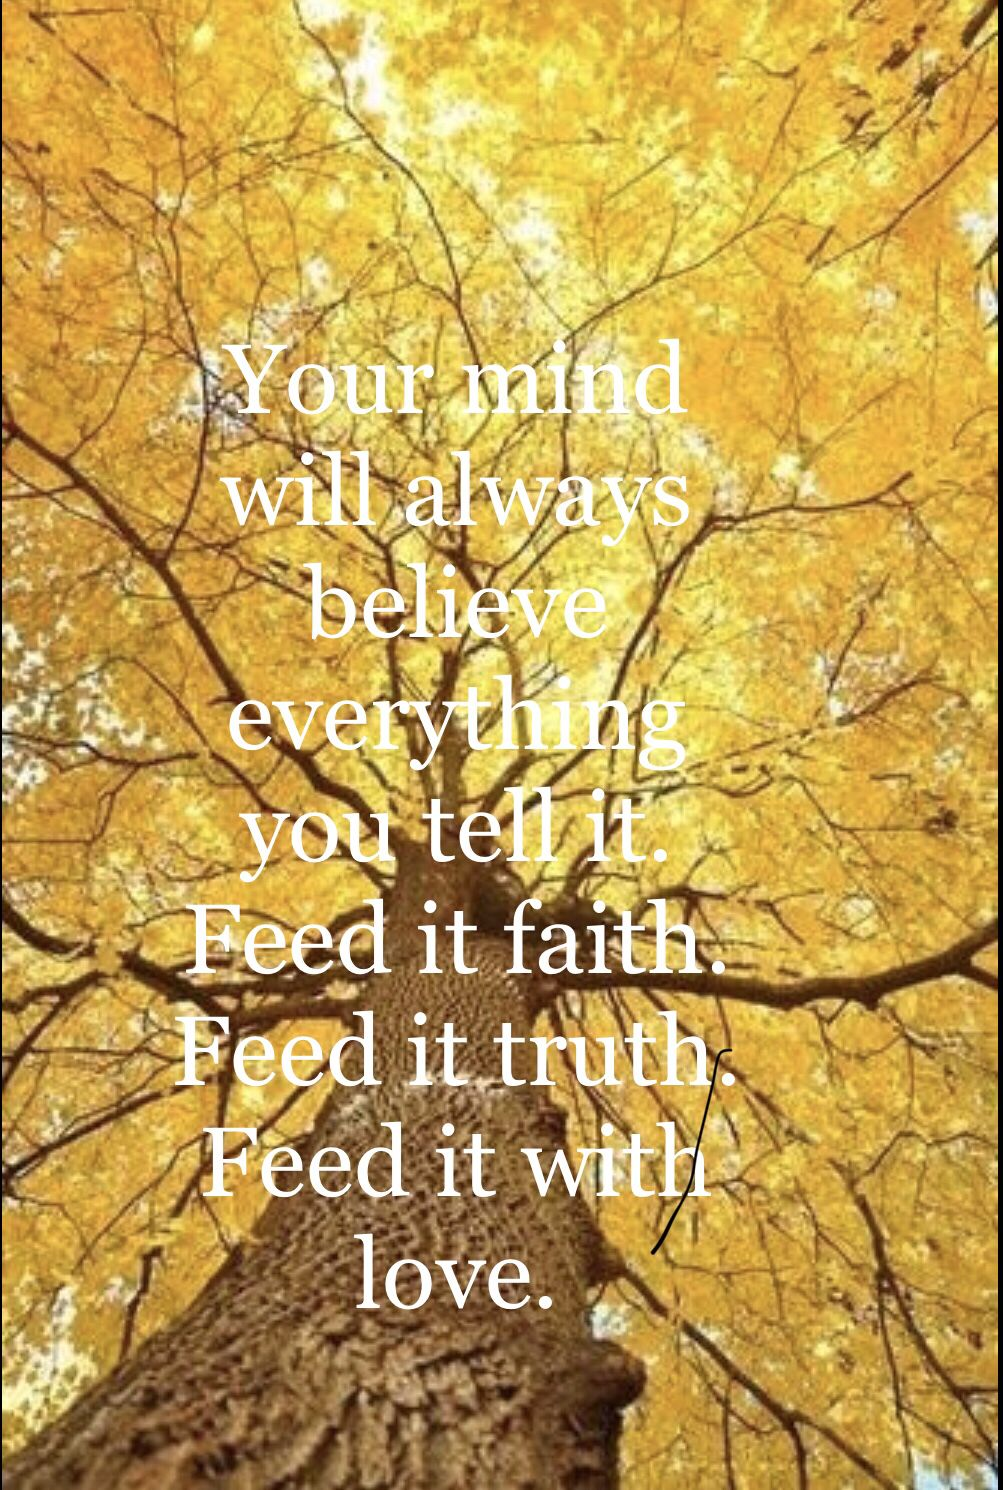 Believe, faith, truth! Happy Sunday ❤️ #fun #findyourpassion #life